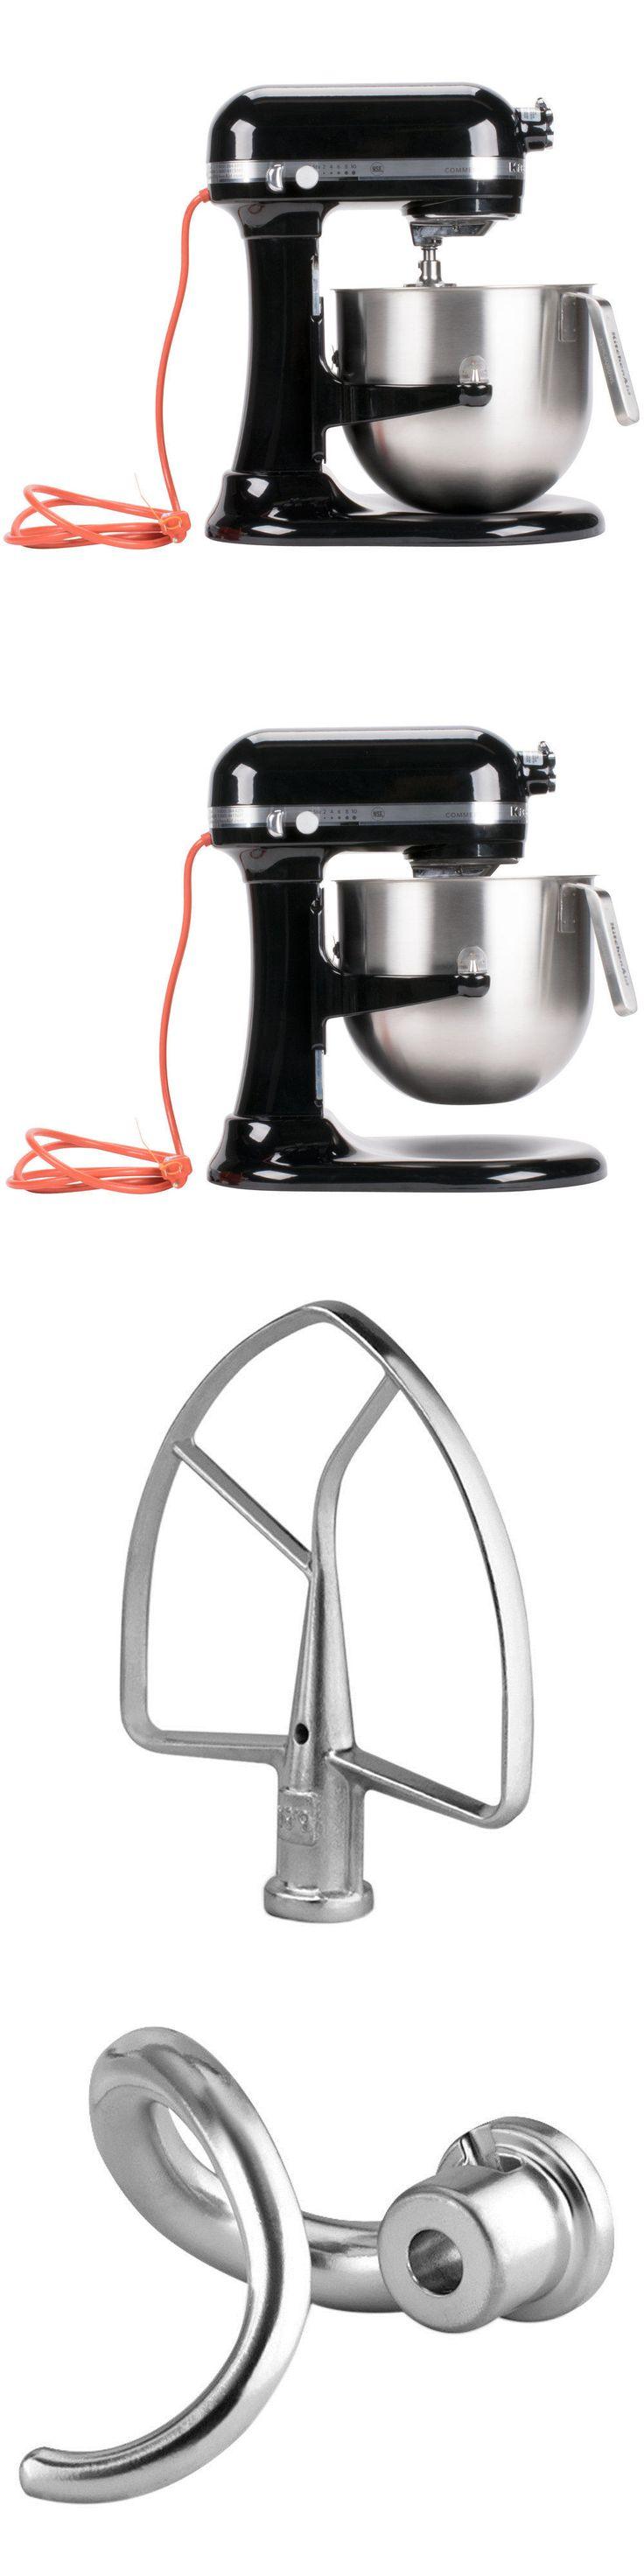 1000 Ideas About Small Kitchen Appliances On Pinterest